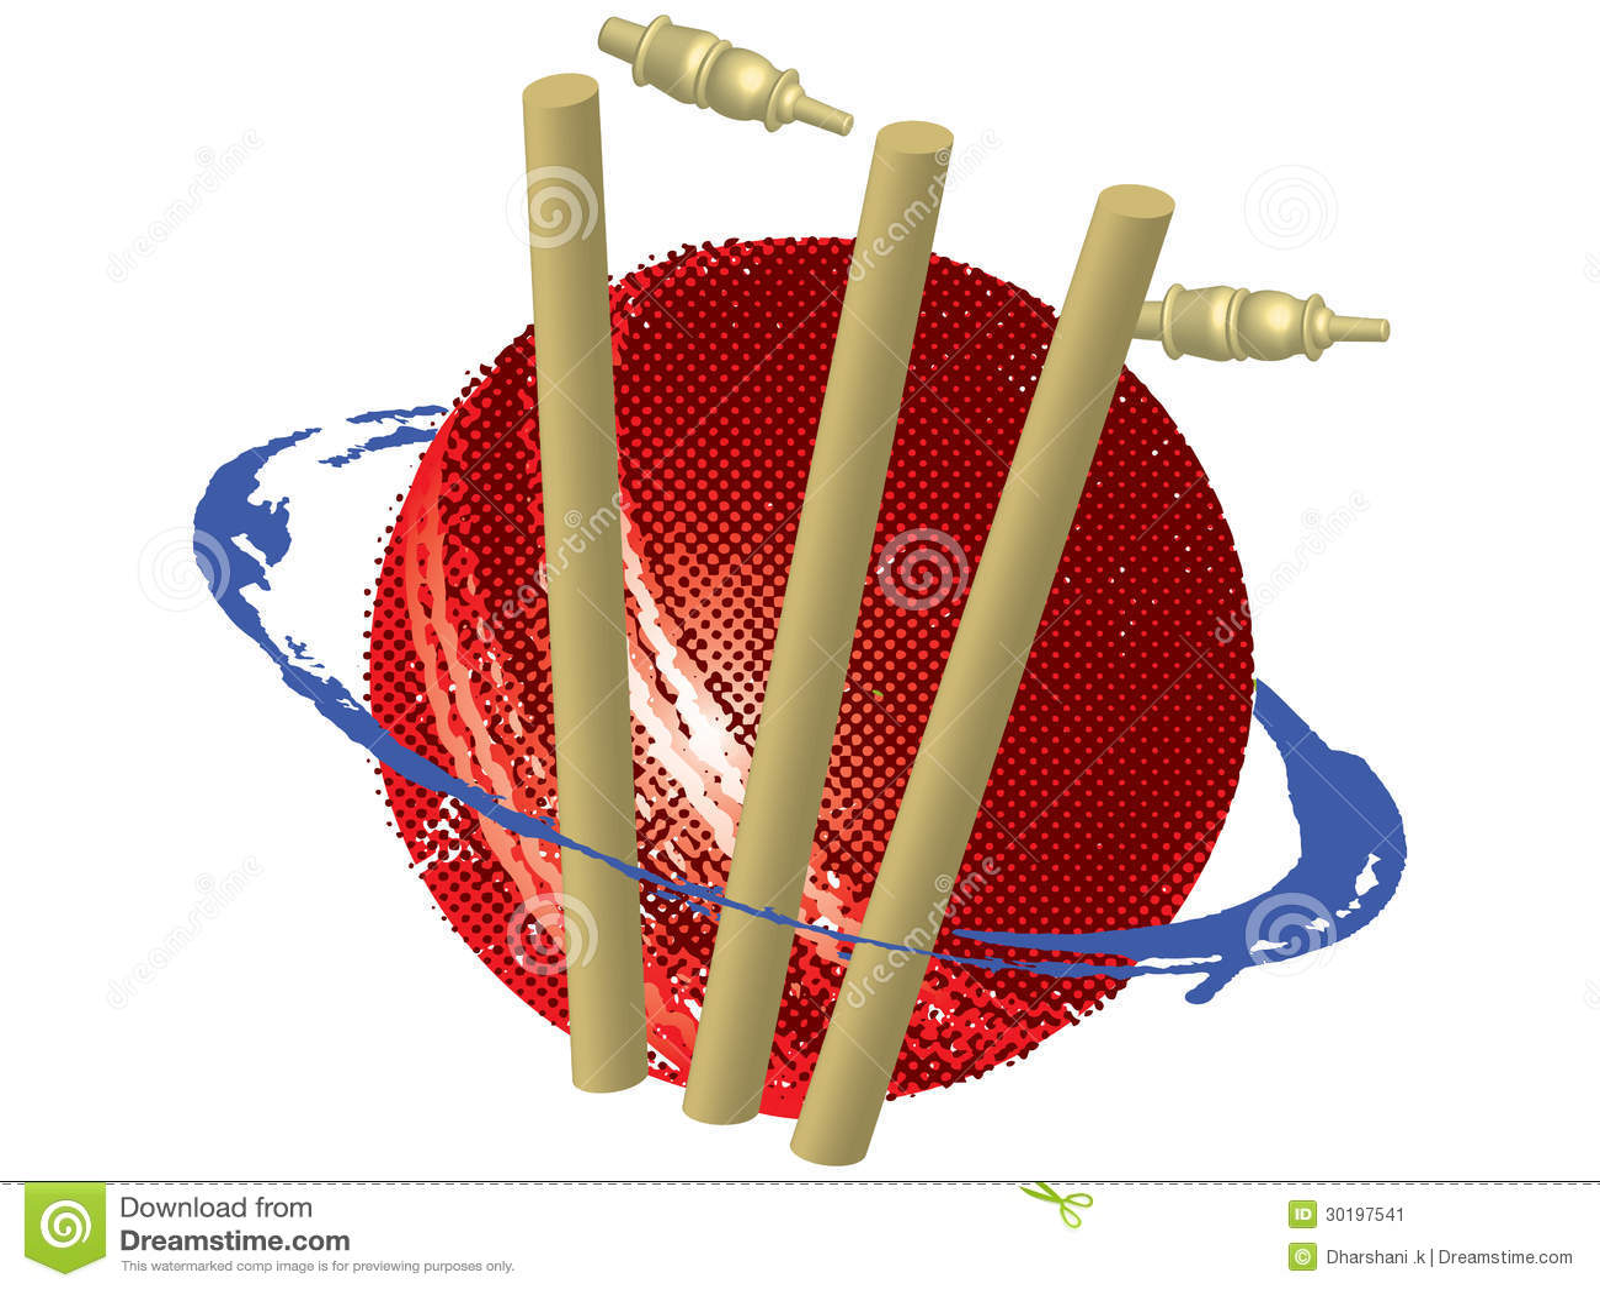 Cricket Vector Background Stock Image: Cricket Symbol Stock Image